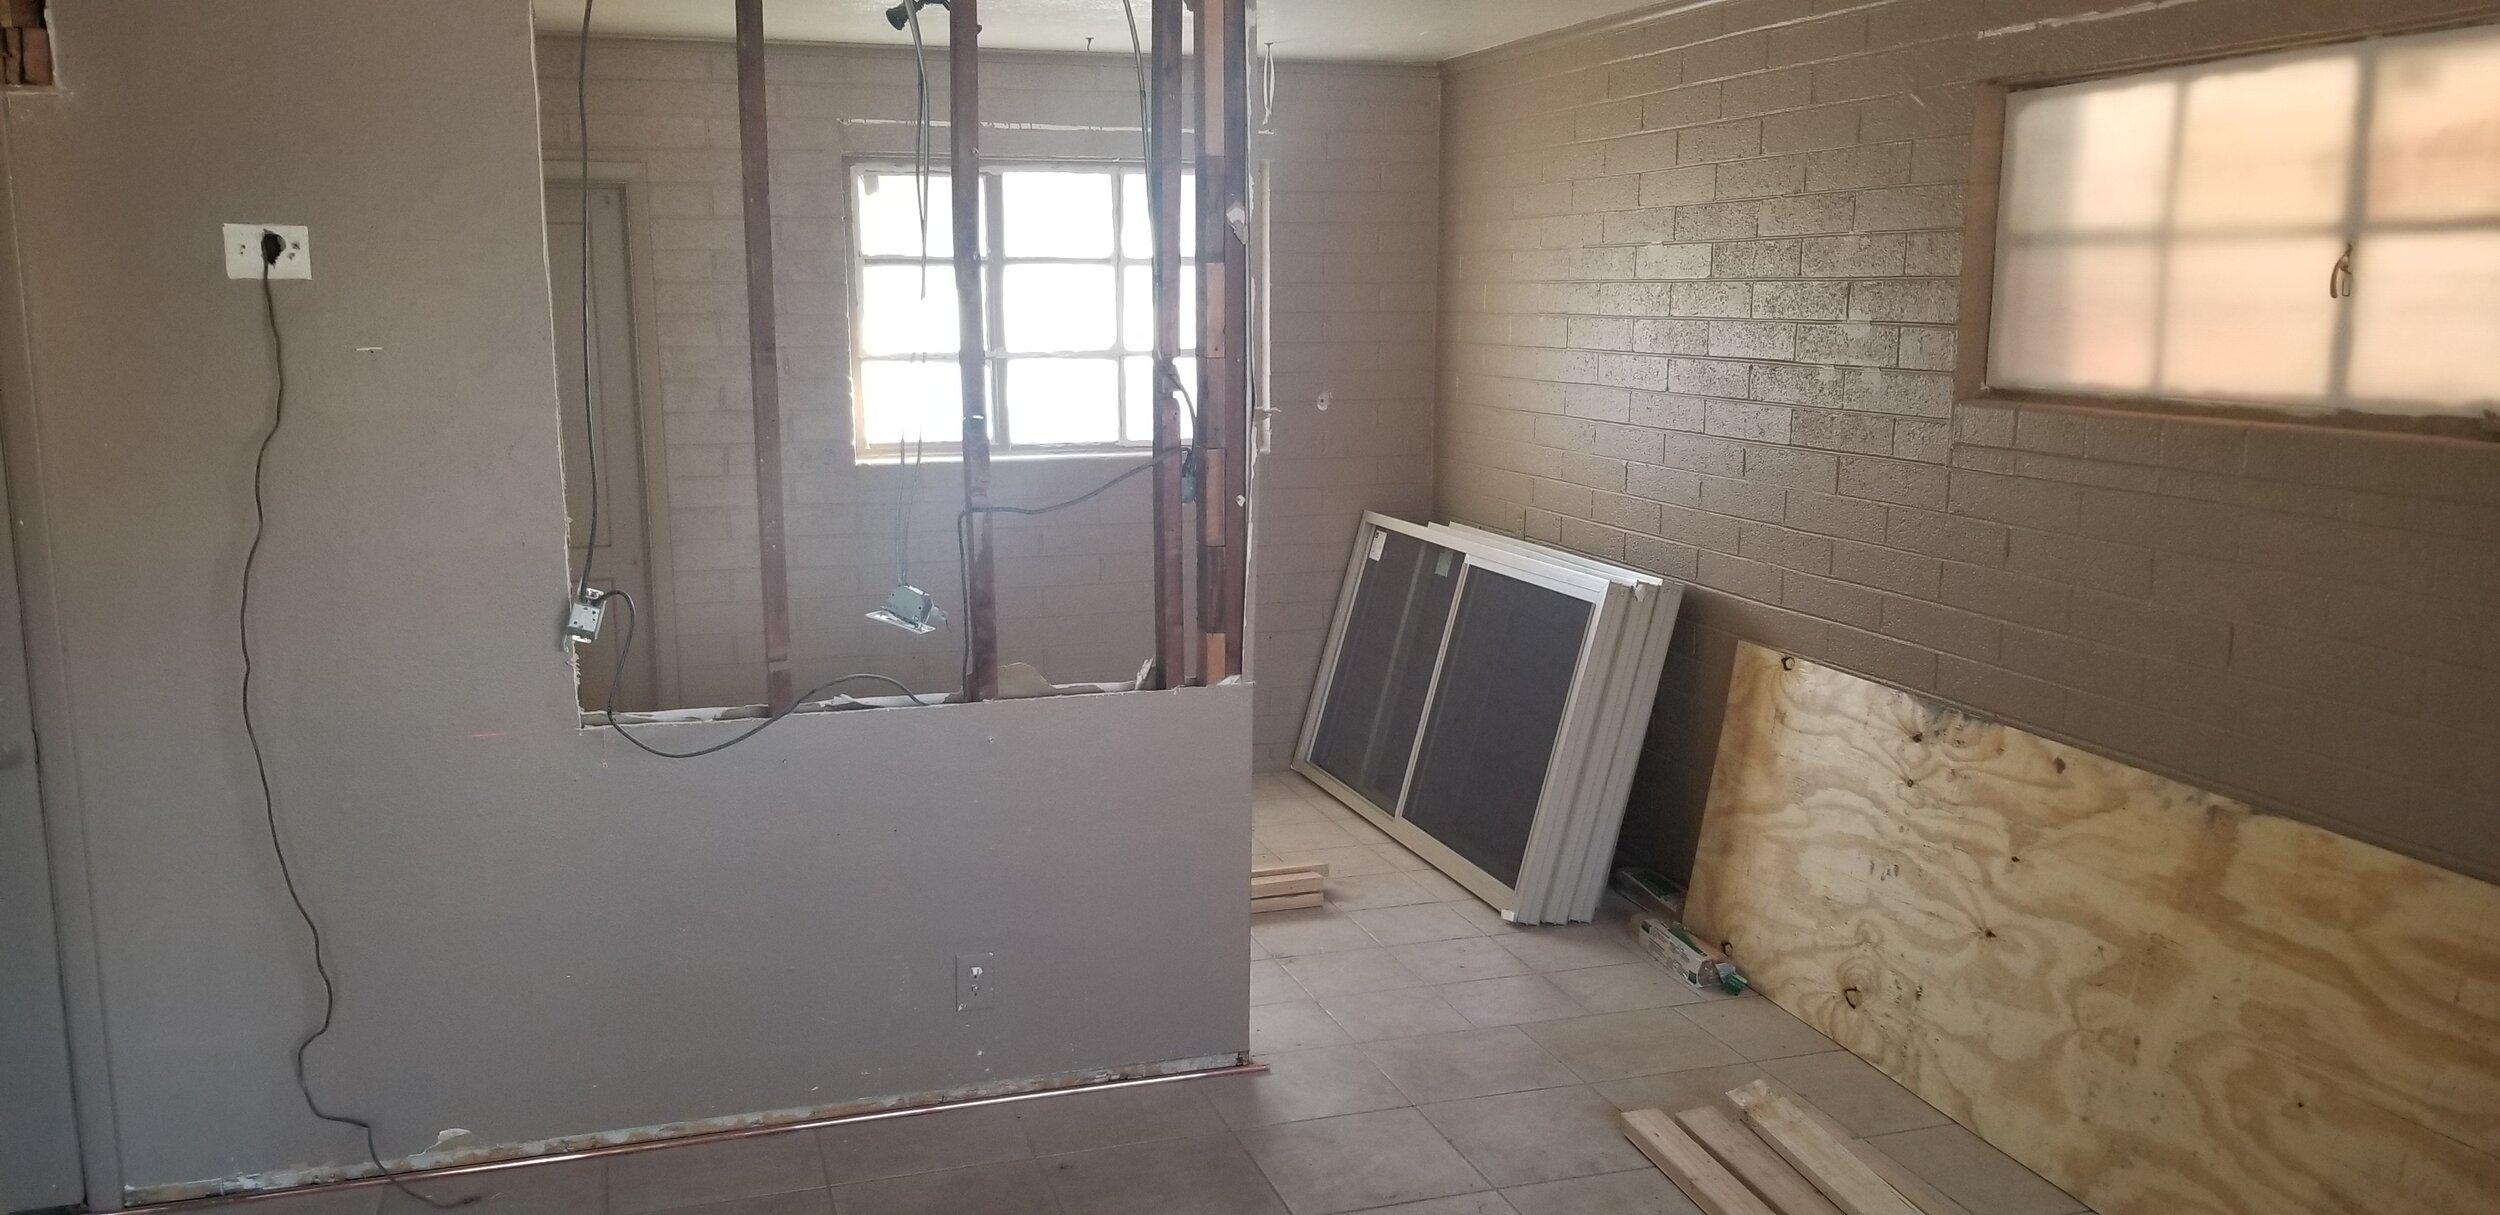 Living room demo